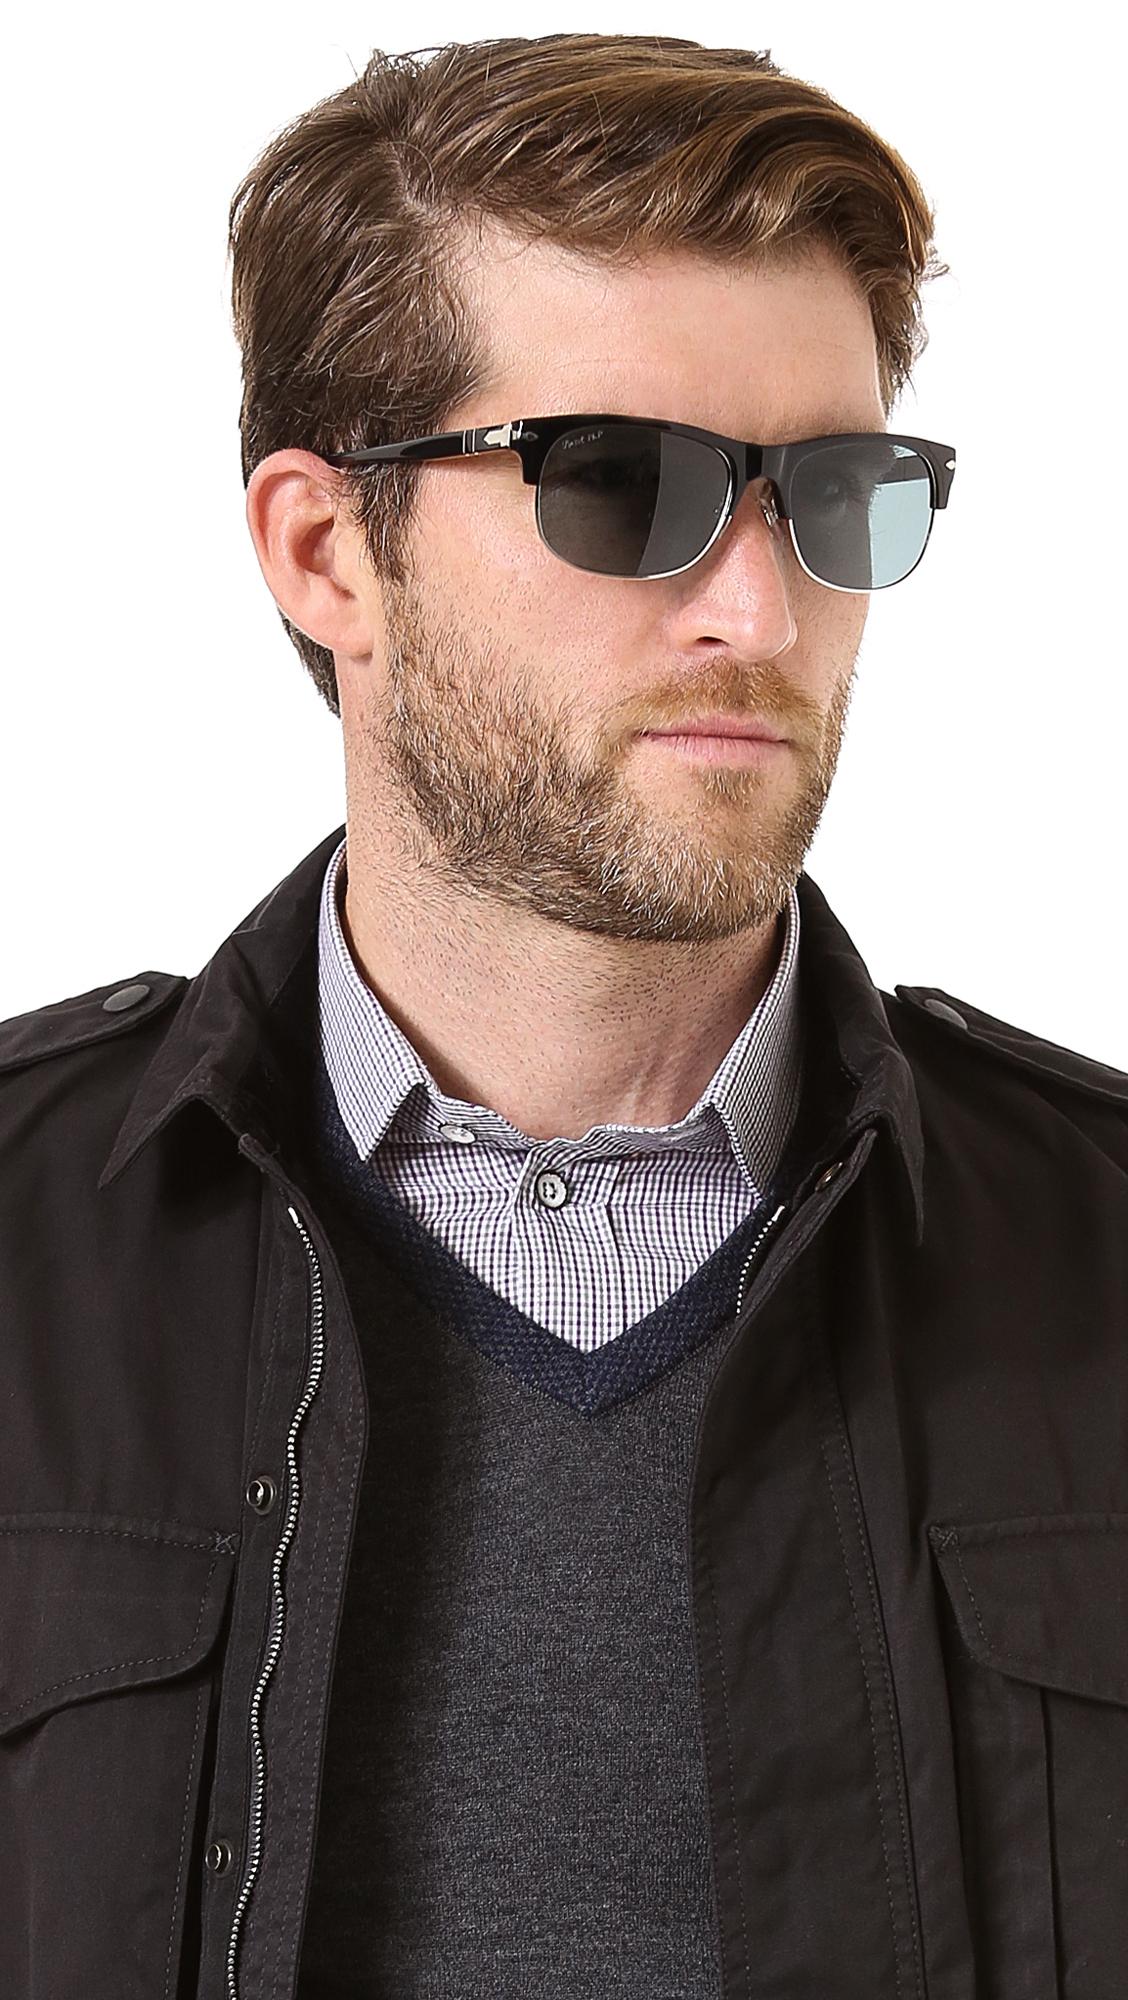 0f2b12eafb7ca Persol Clubmaster Polarized Sunglasses in Black for Men - Lyst